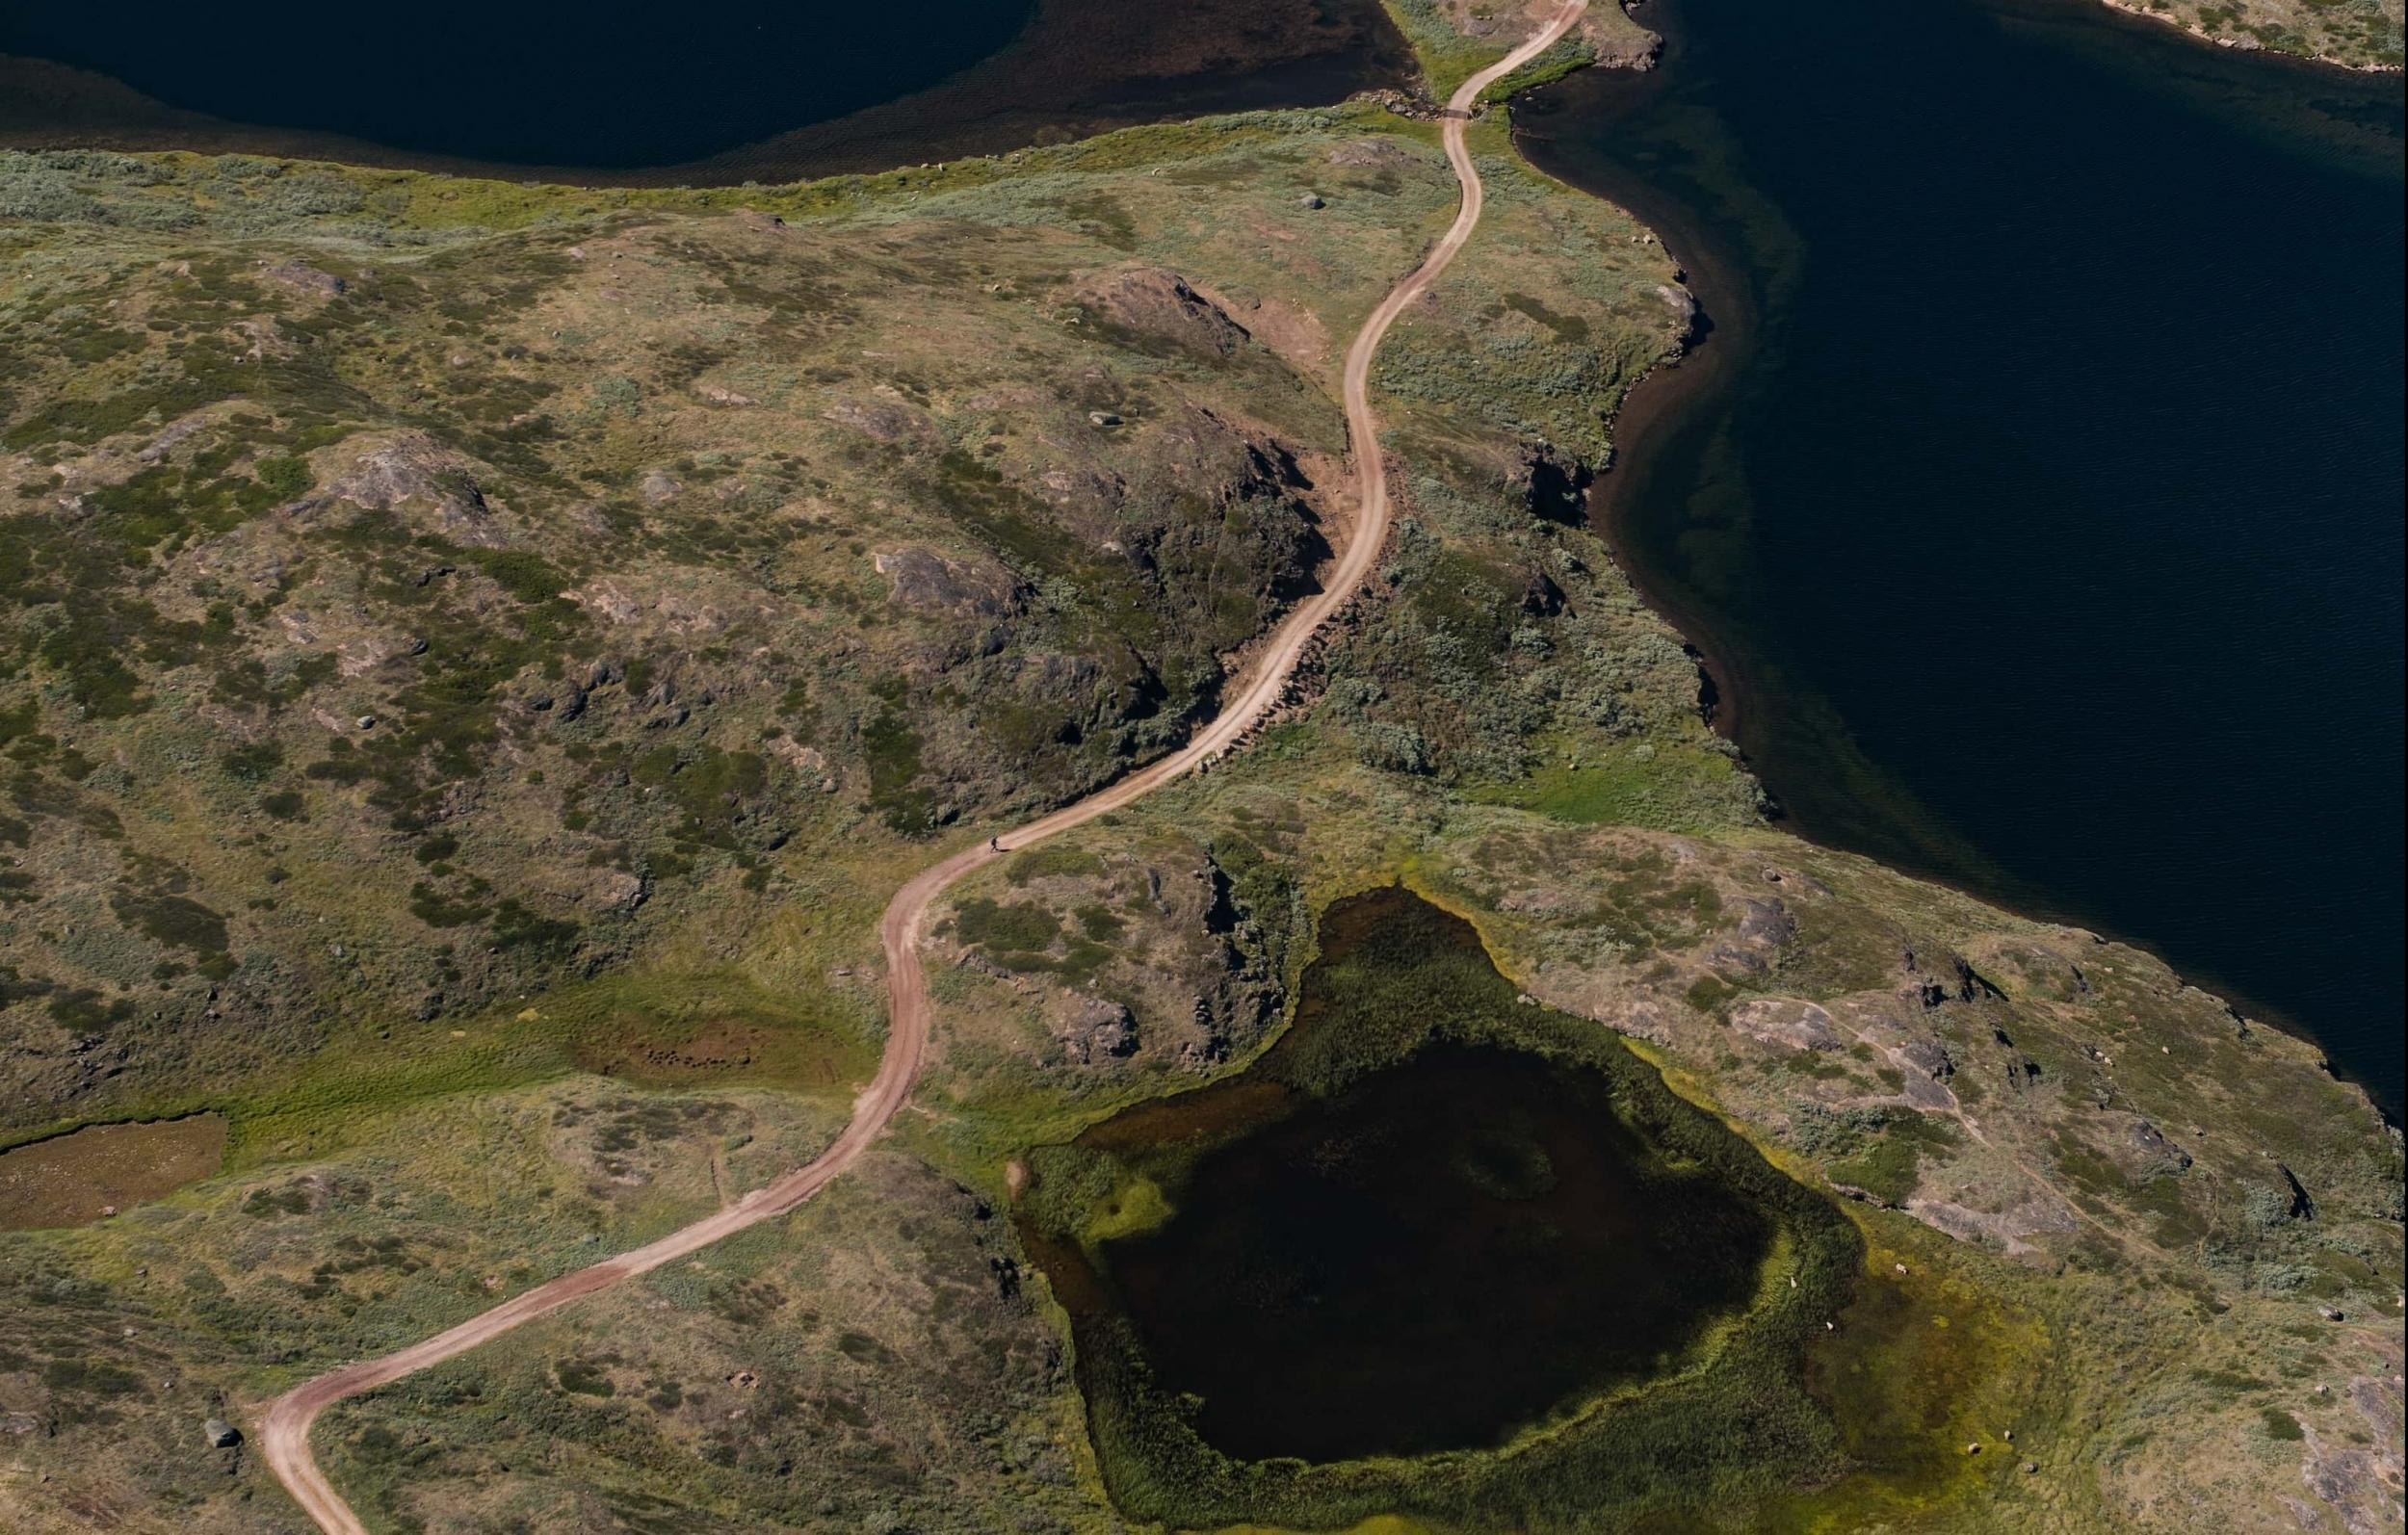 Road to Tasiusaq from Qassiarsuk. Photo by Aningaaq R Carlsen